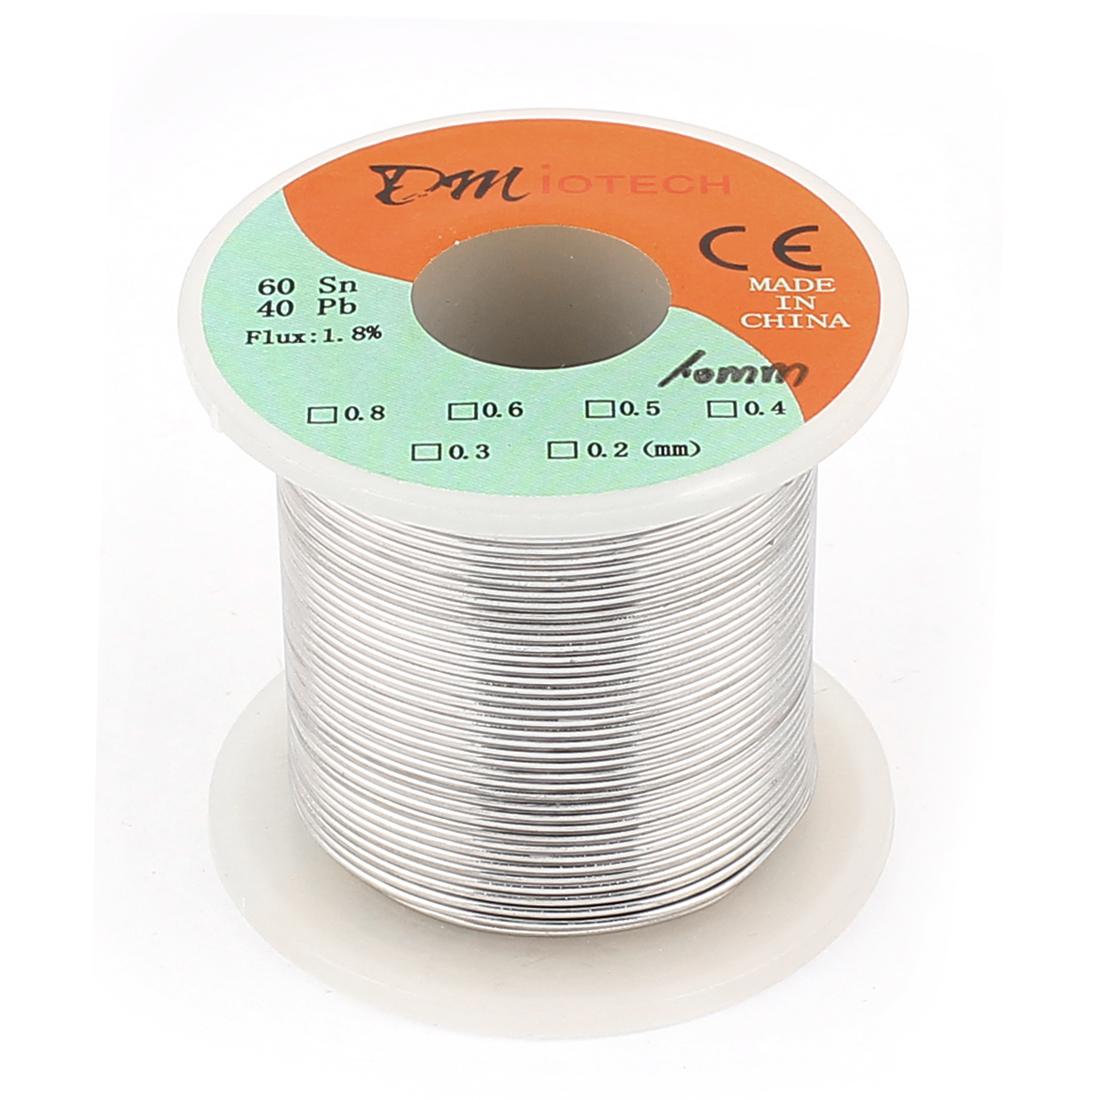 1mm 200G 60/40 Rosin Core Tin Lead Roll Soldering Solder Wire